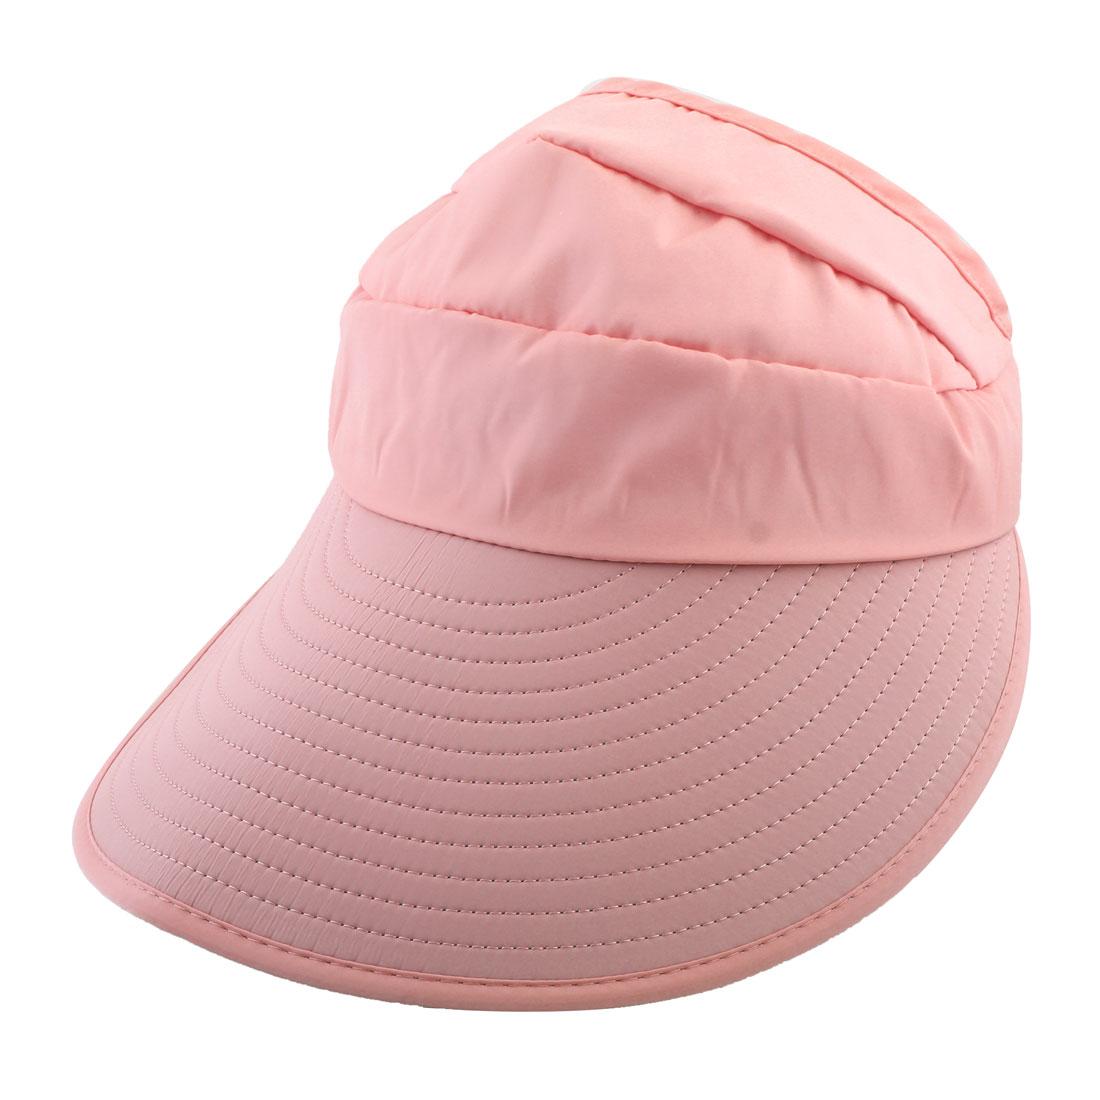 Lady Polyester Leaf Printed Summer Travel Holiday Beach Floppy Cap Sun Visor Hat Pink